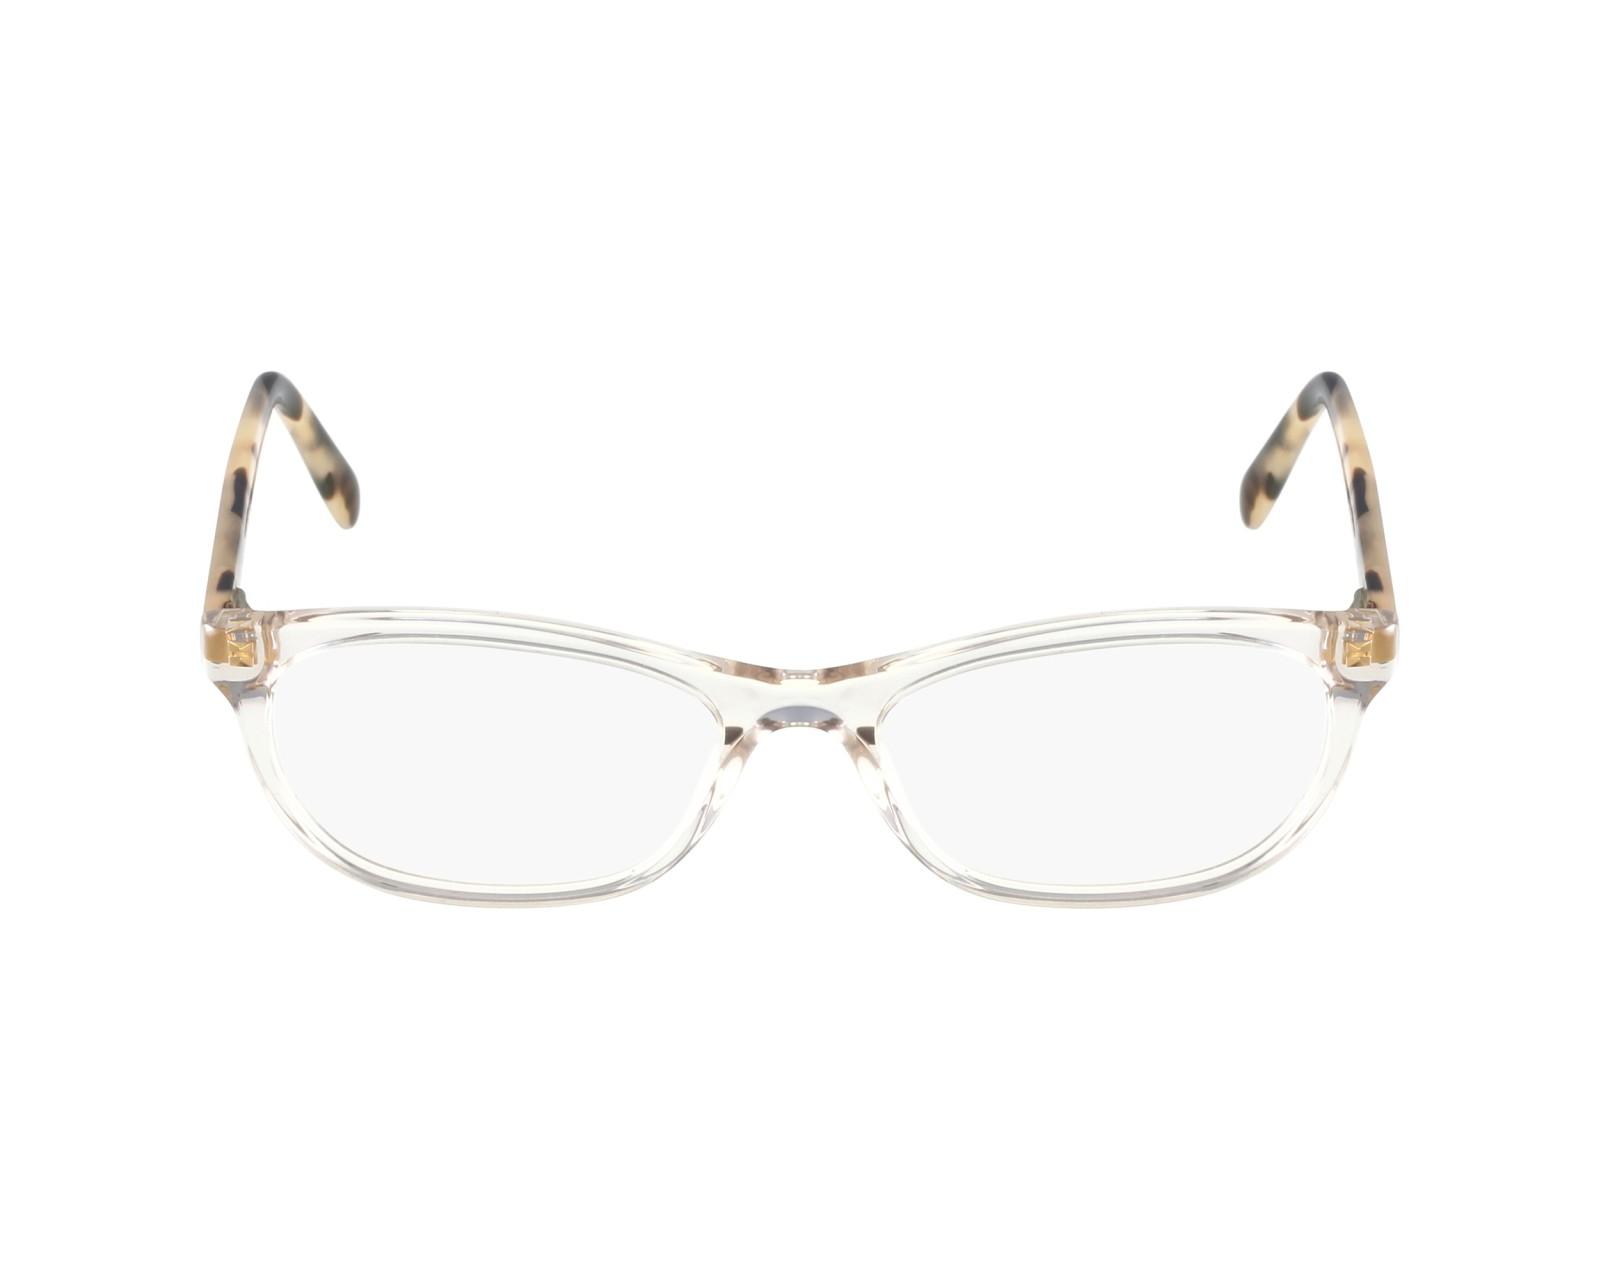 c79be3cec4 eyeglasses Burberry BE-2180 3503 - Crystal Beige profile view